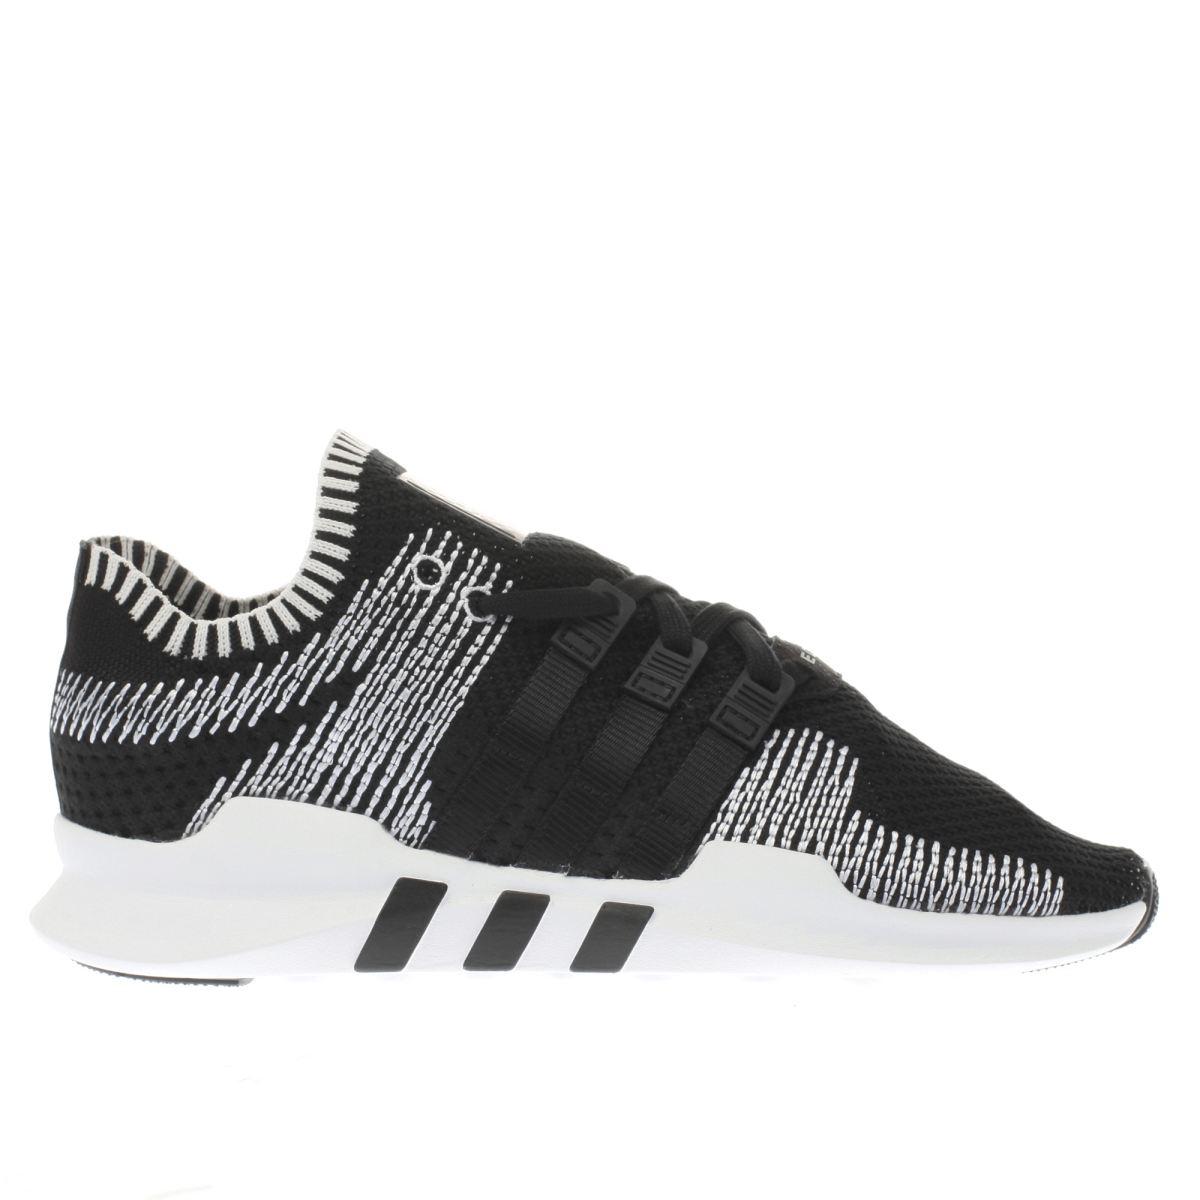 adidas black & white eqt support adv primeknit trainers